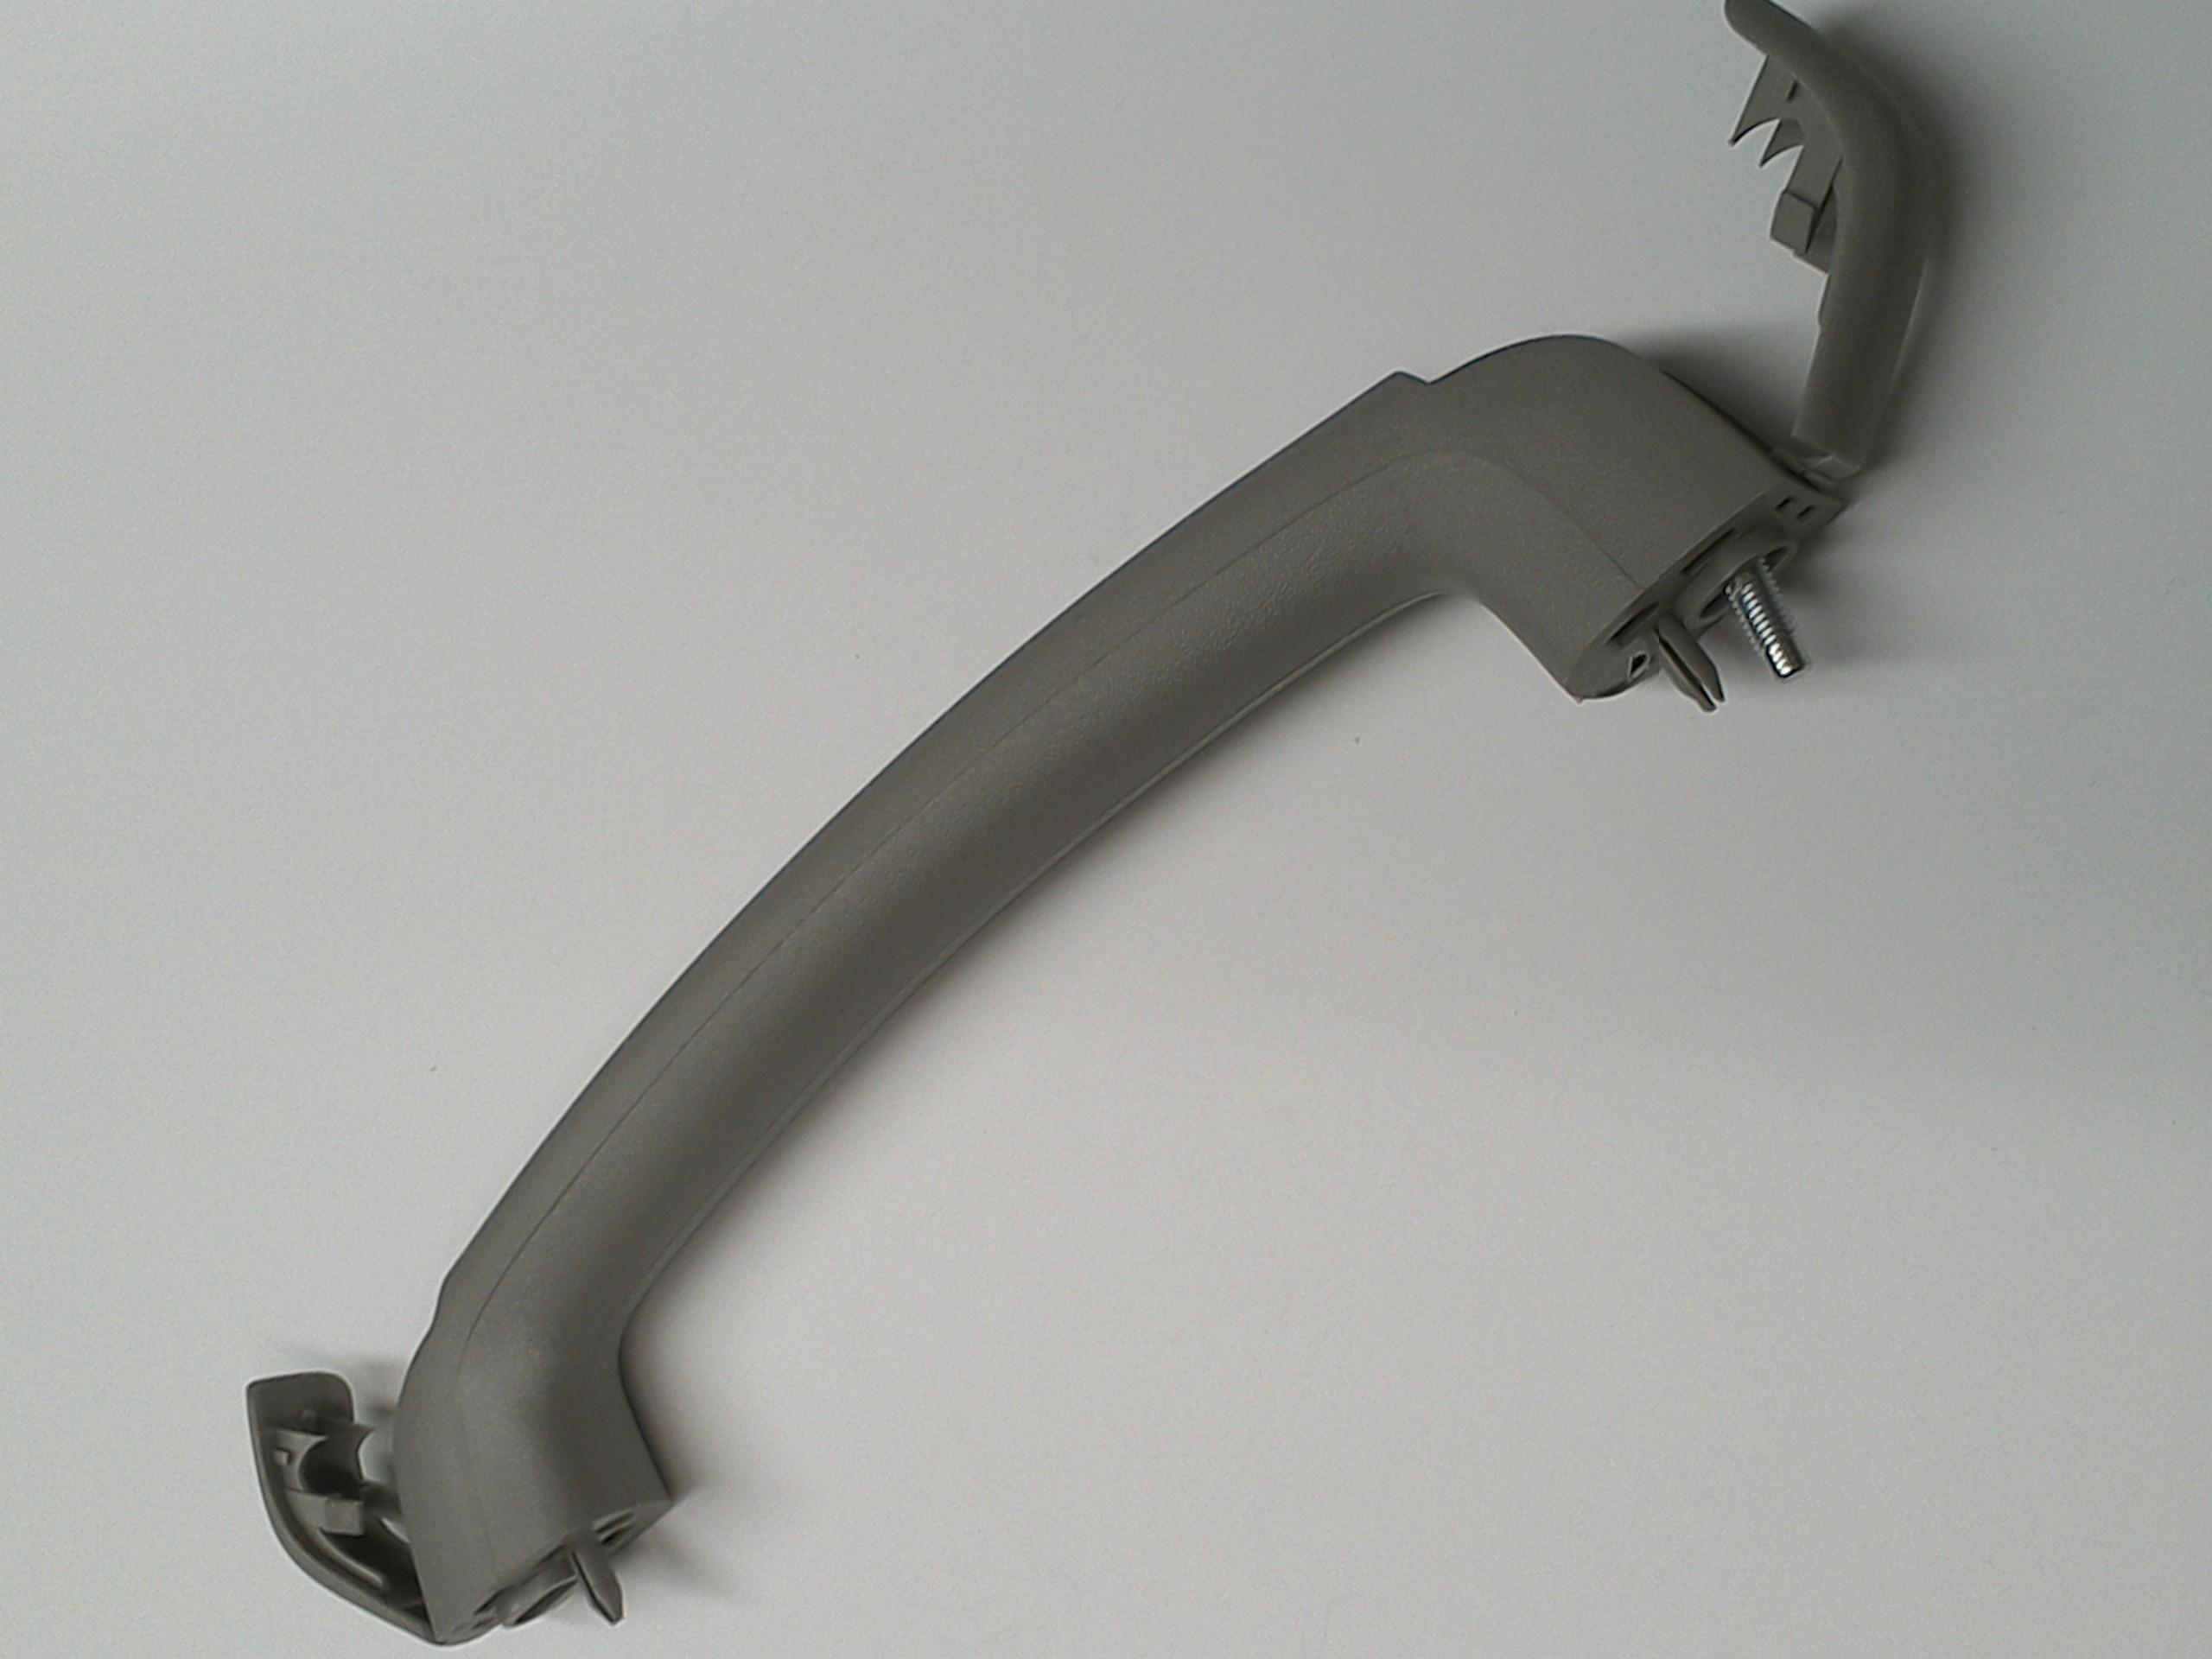 739407s040 nissan assist strap grip handle interior grab bar sunroof trim cab hyman. Black Bedroom Furniture Sets. Home Design Ideas